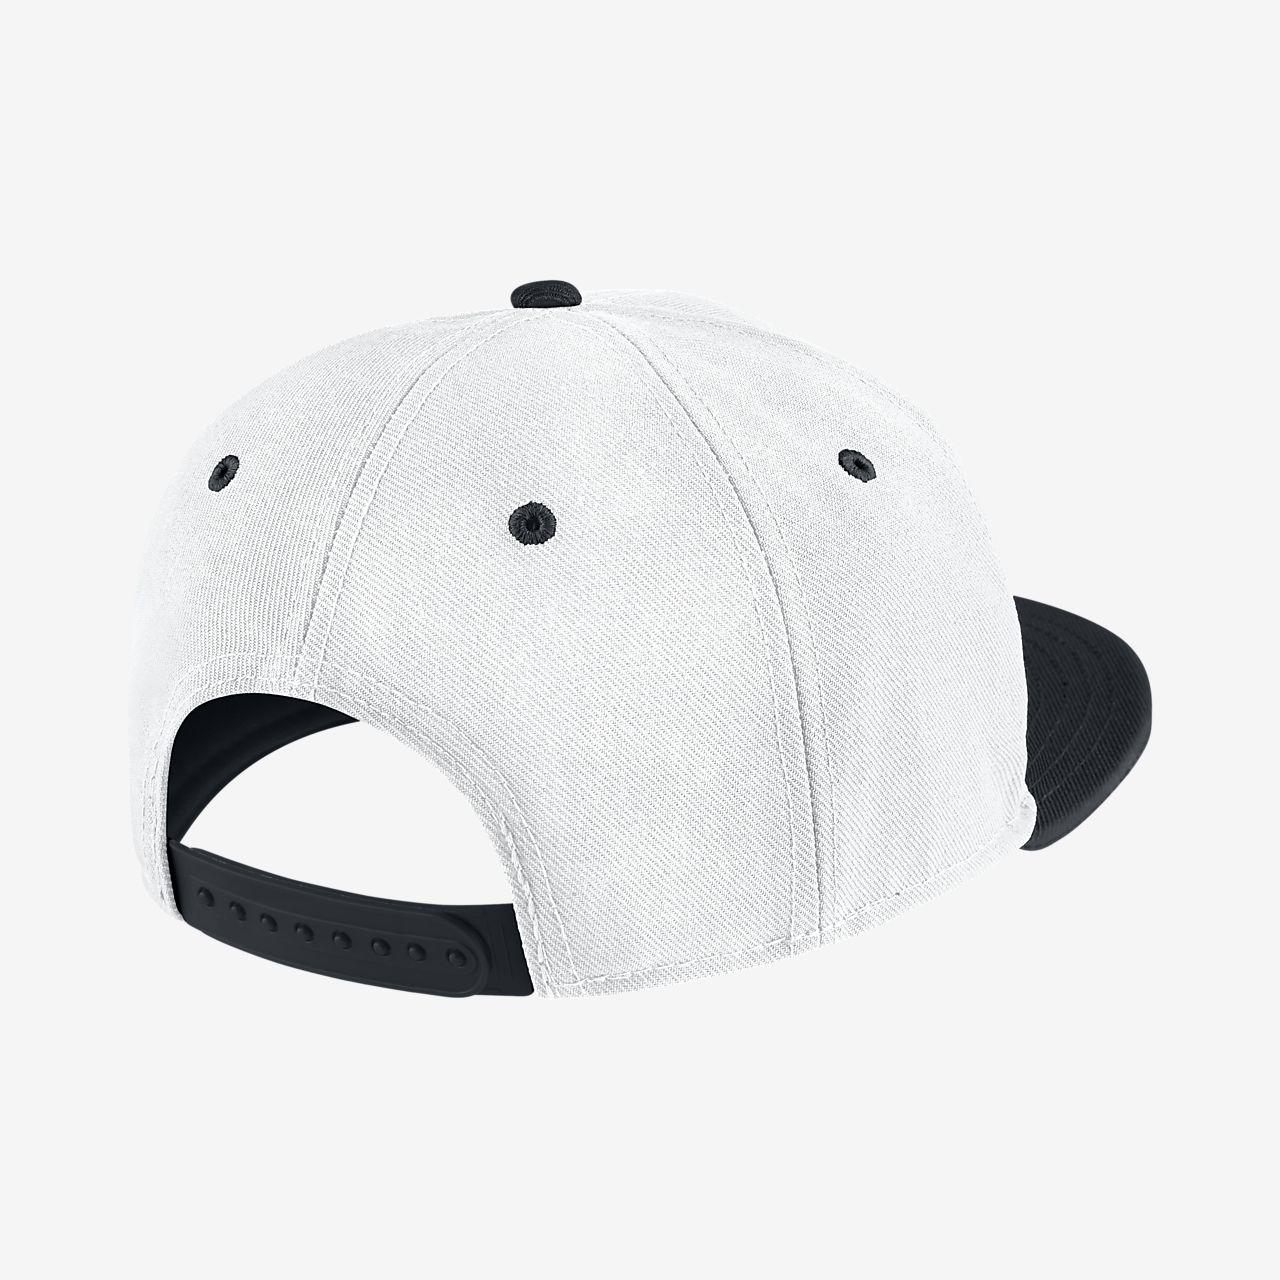 20e97568d47 Nike Futura True Older Kids  Adjustable Hat. Nike.com AU